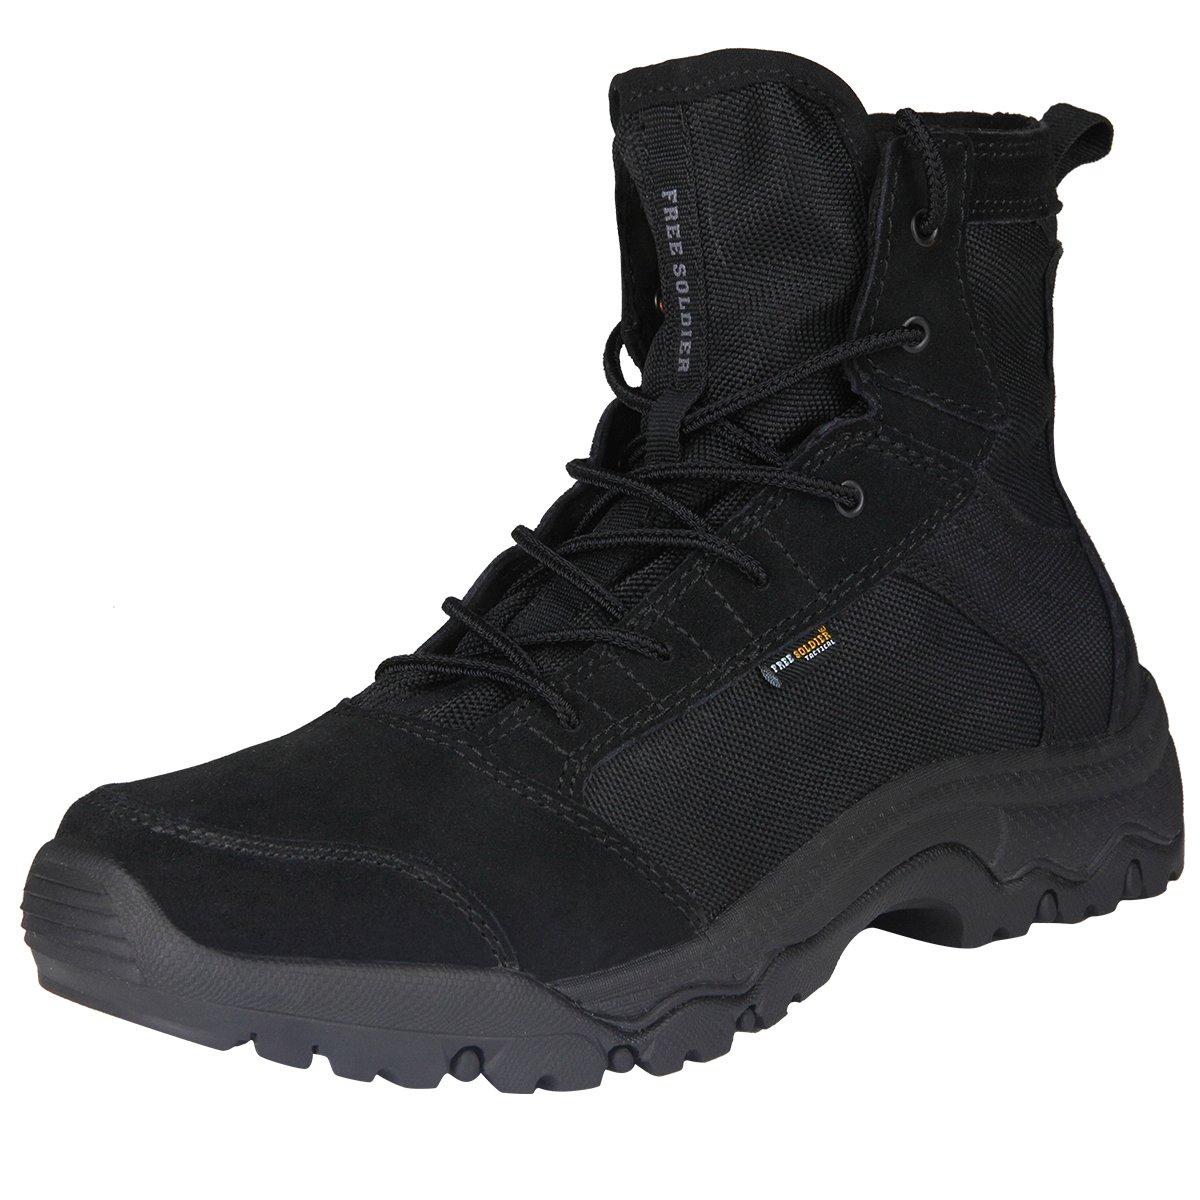 FREE SOLDIER Men's Lightweight Tactical Boots - Desert Tan(Black 11.5 US)